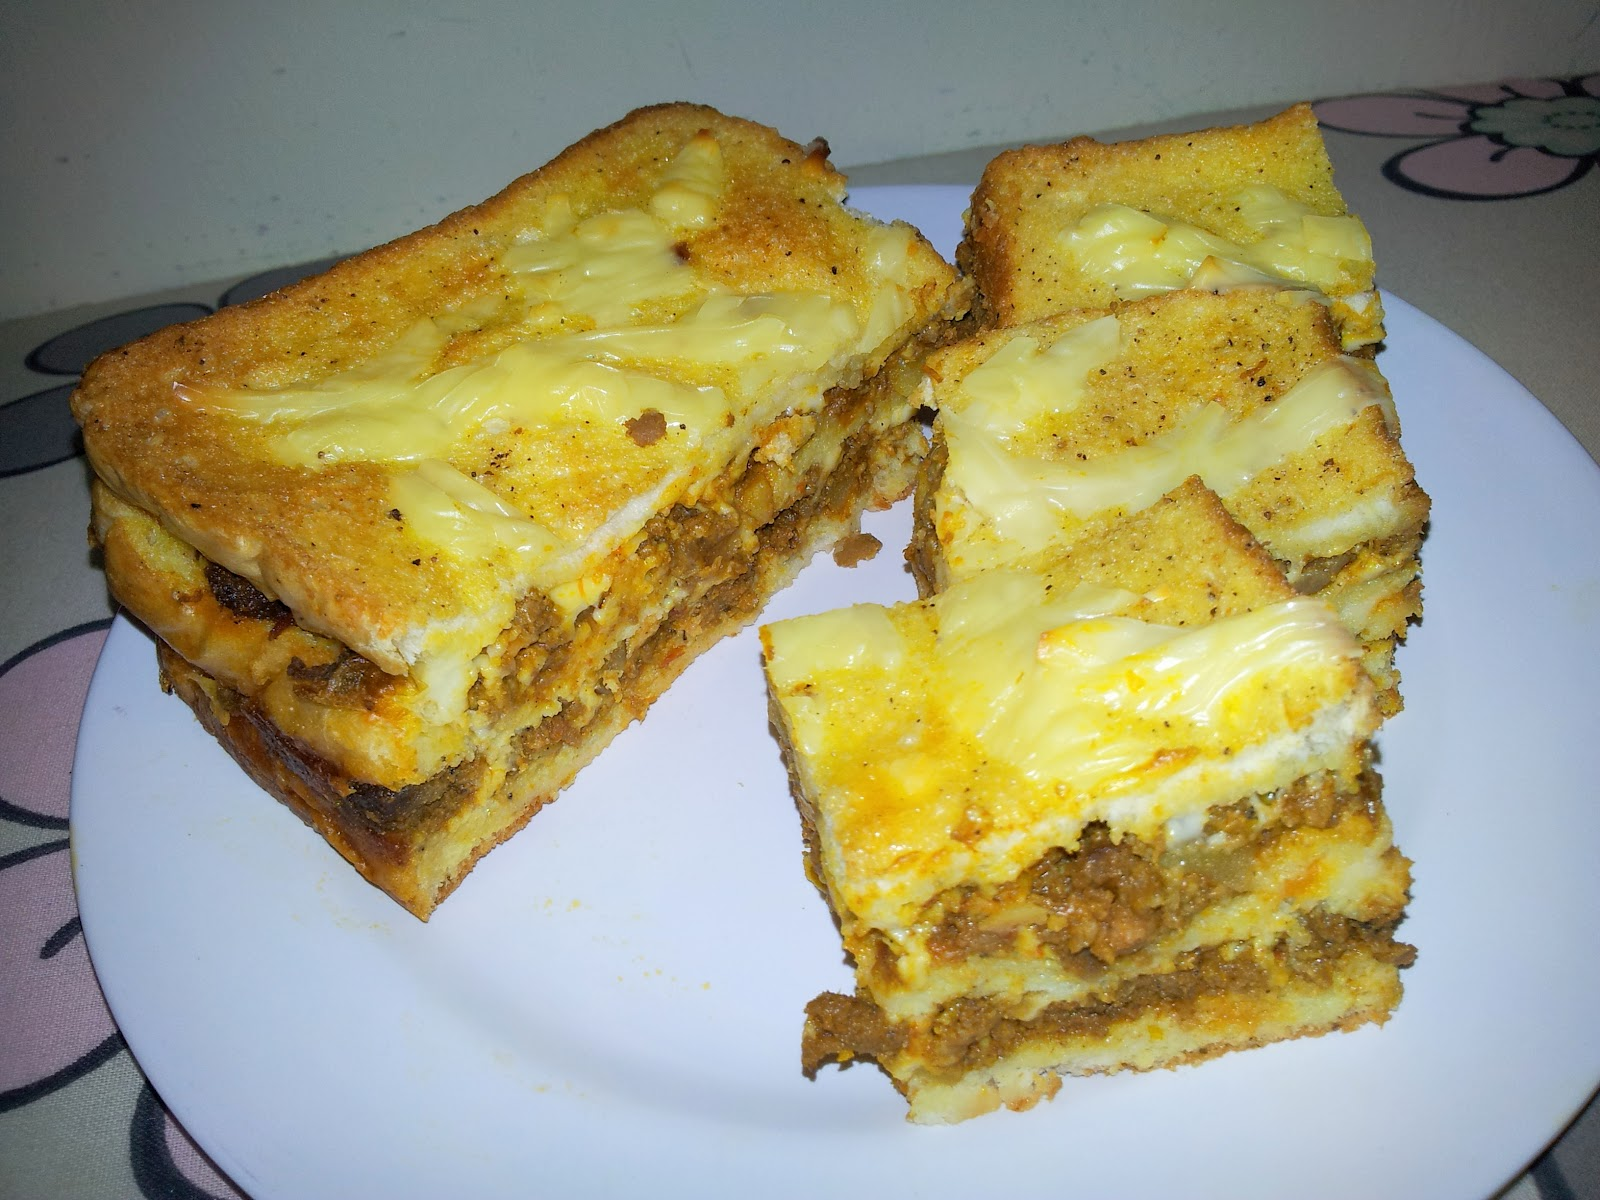 Emmymazli: Resepi Roti Lapis Daging Berkeju @ Lagsana ...